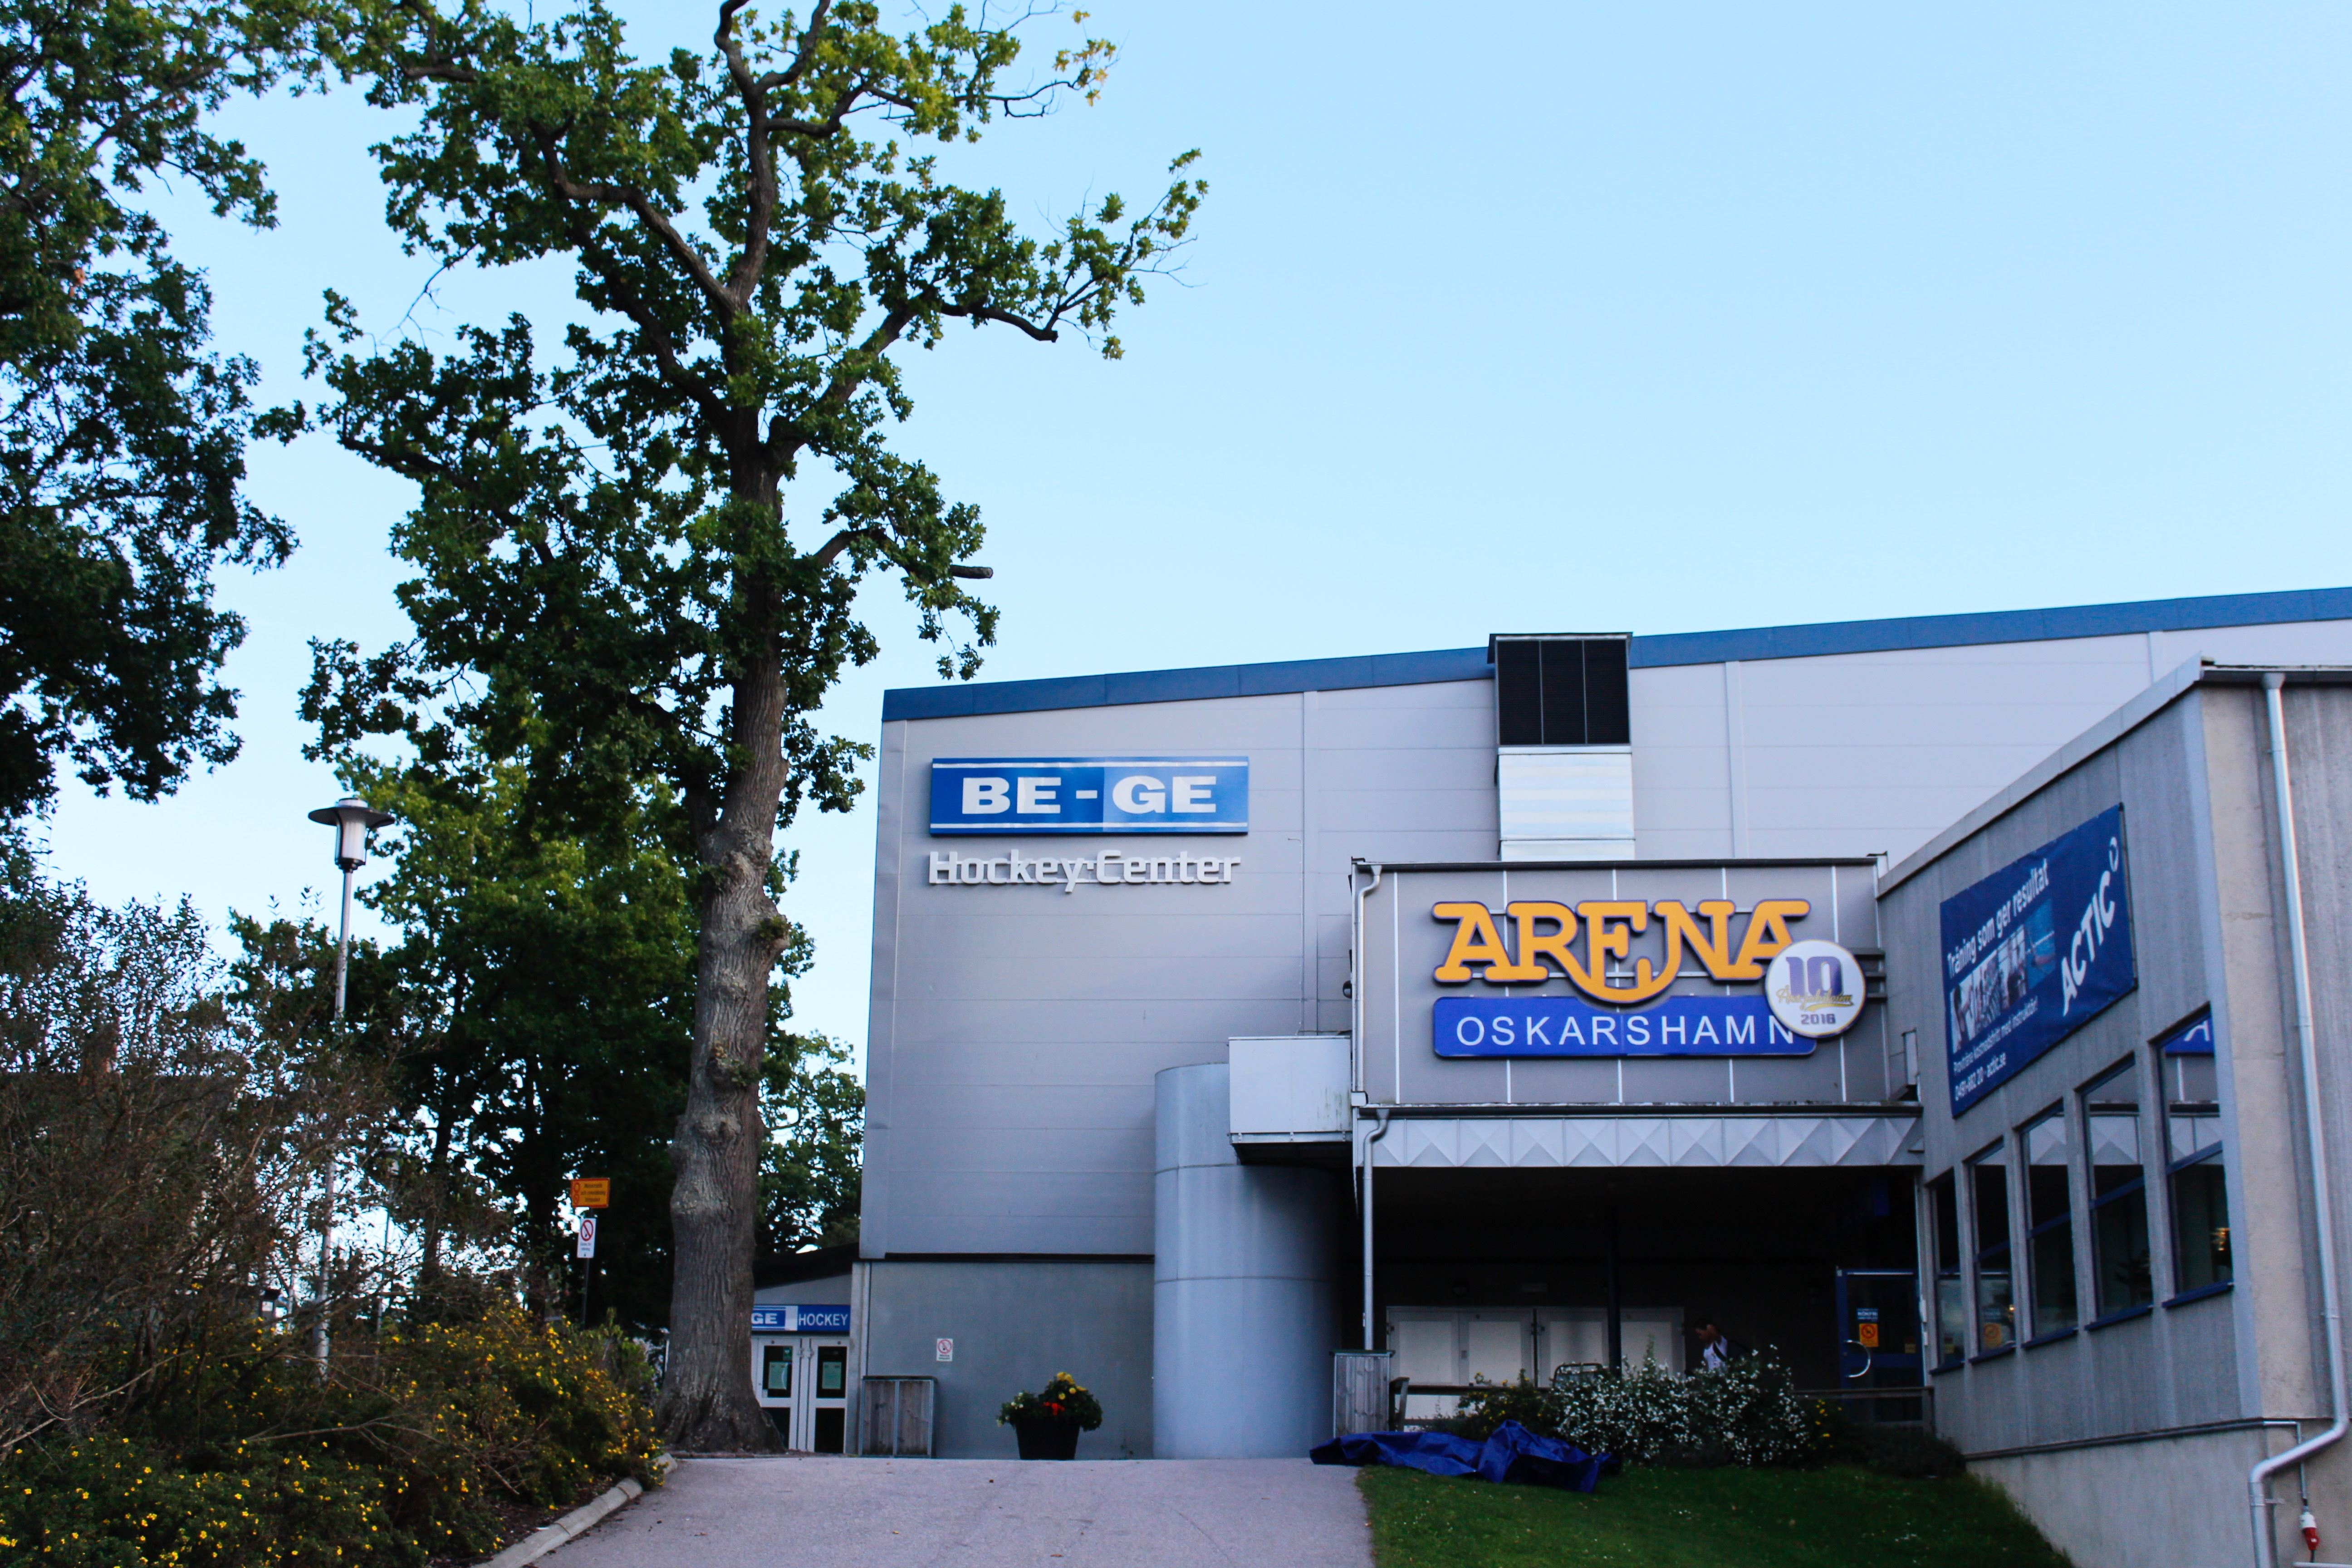 Arena Oskarshamn Public Baths & Gym